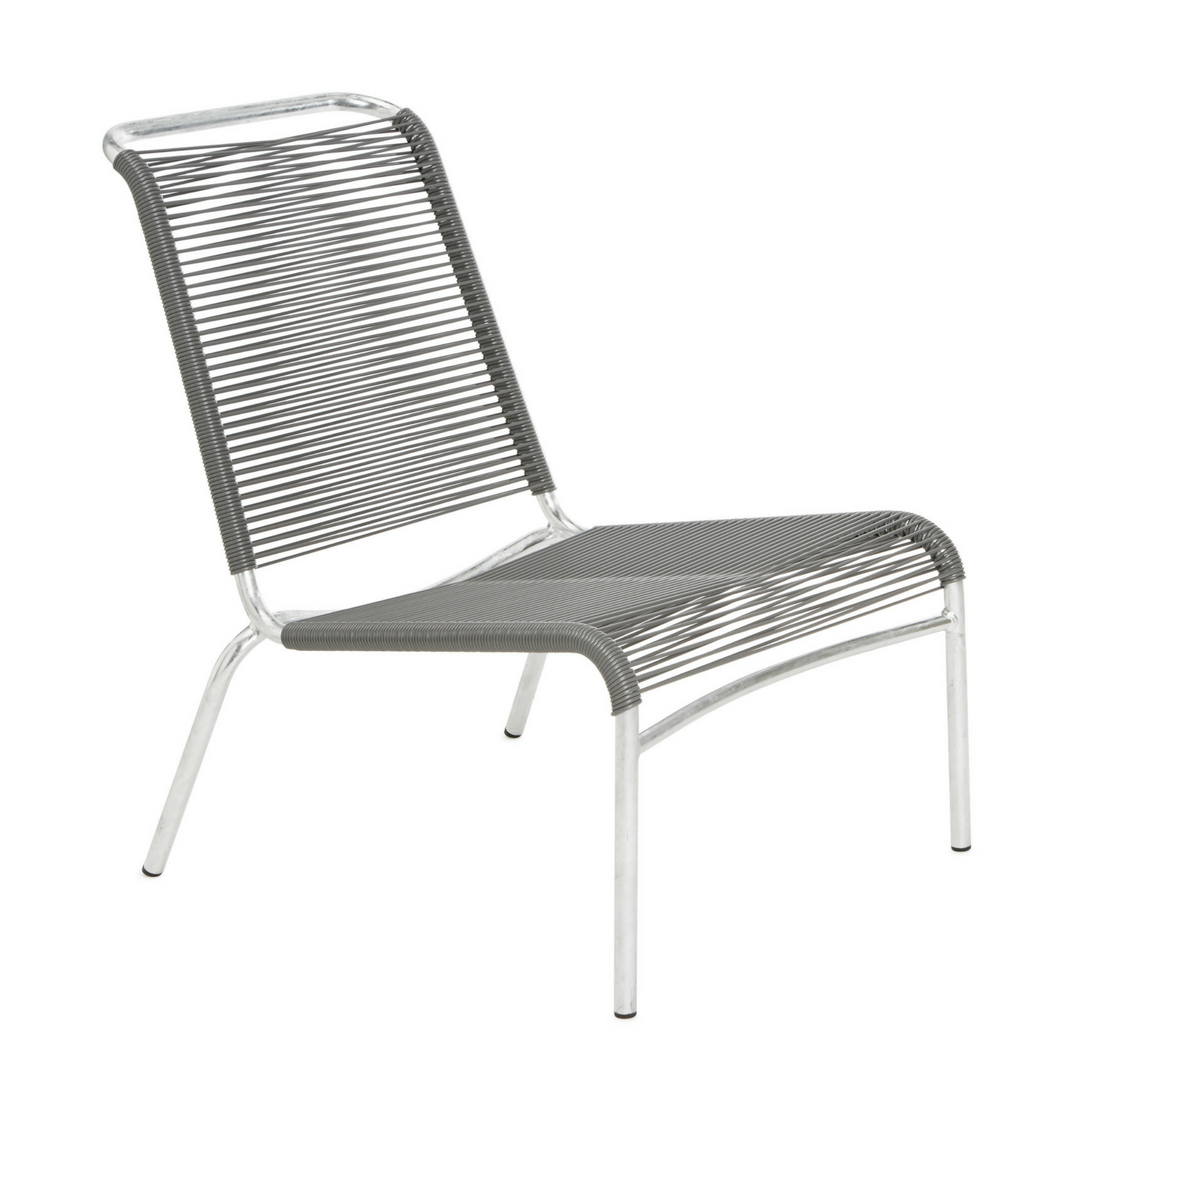 Altorfer Lounge Stuhl 1139 Aschgrau von Embru